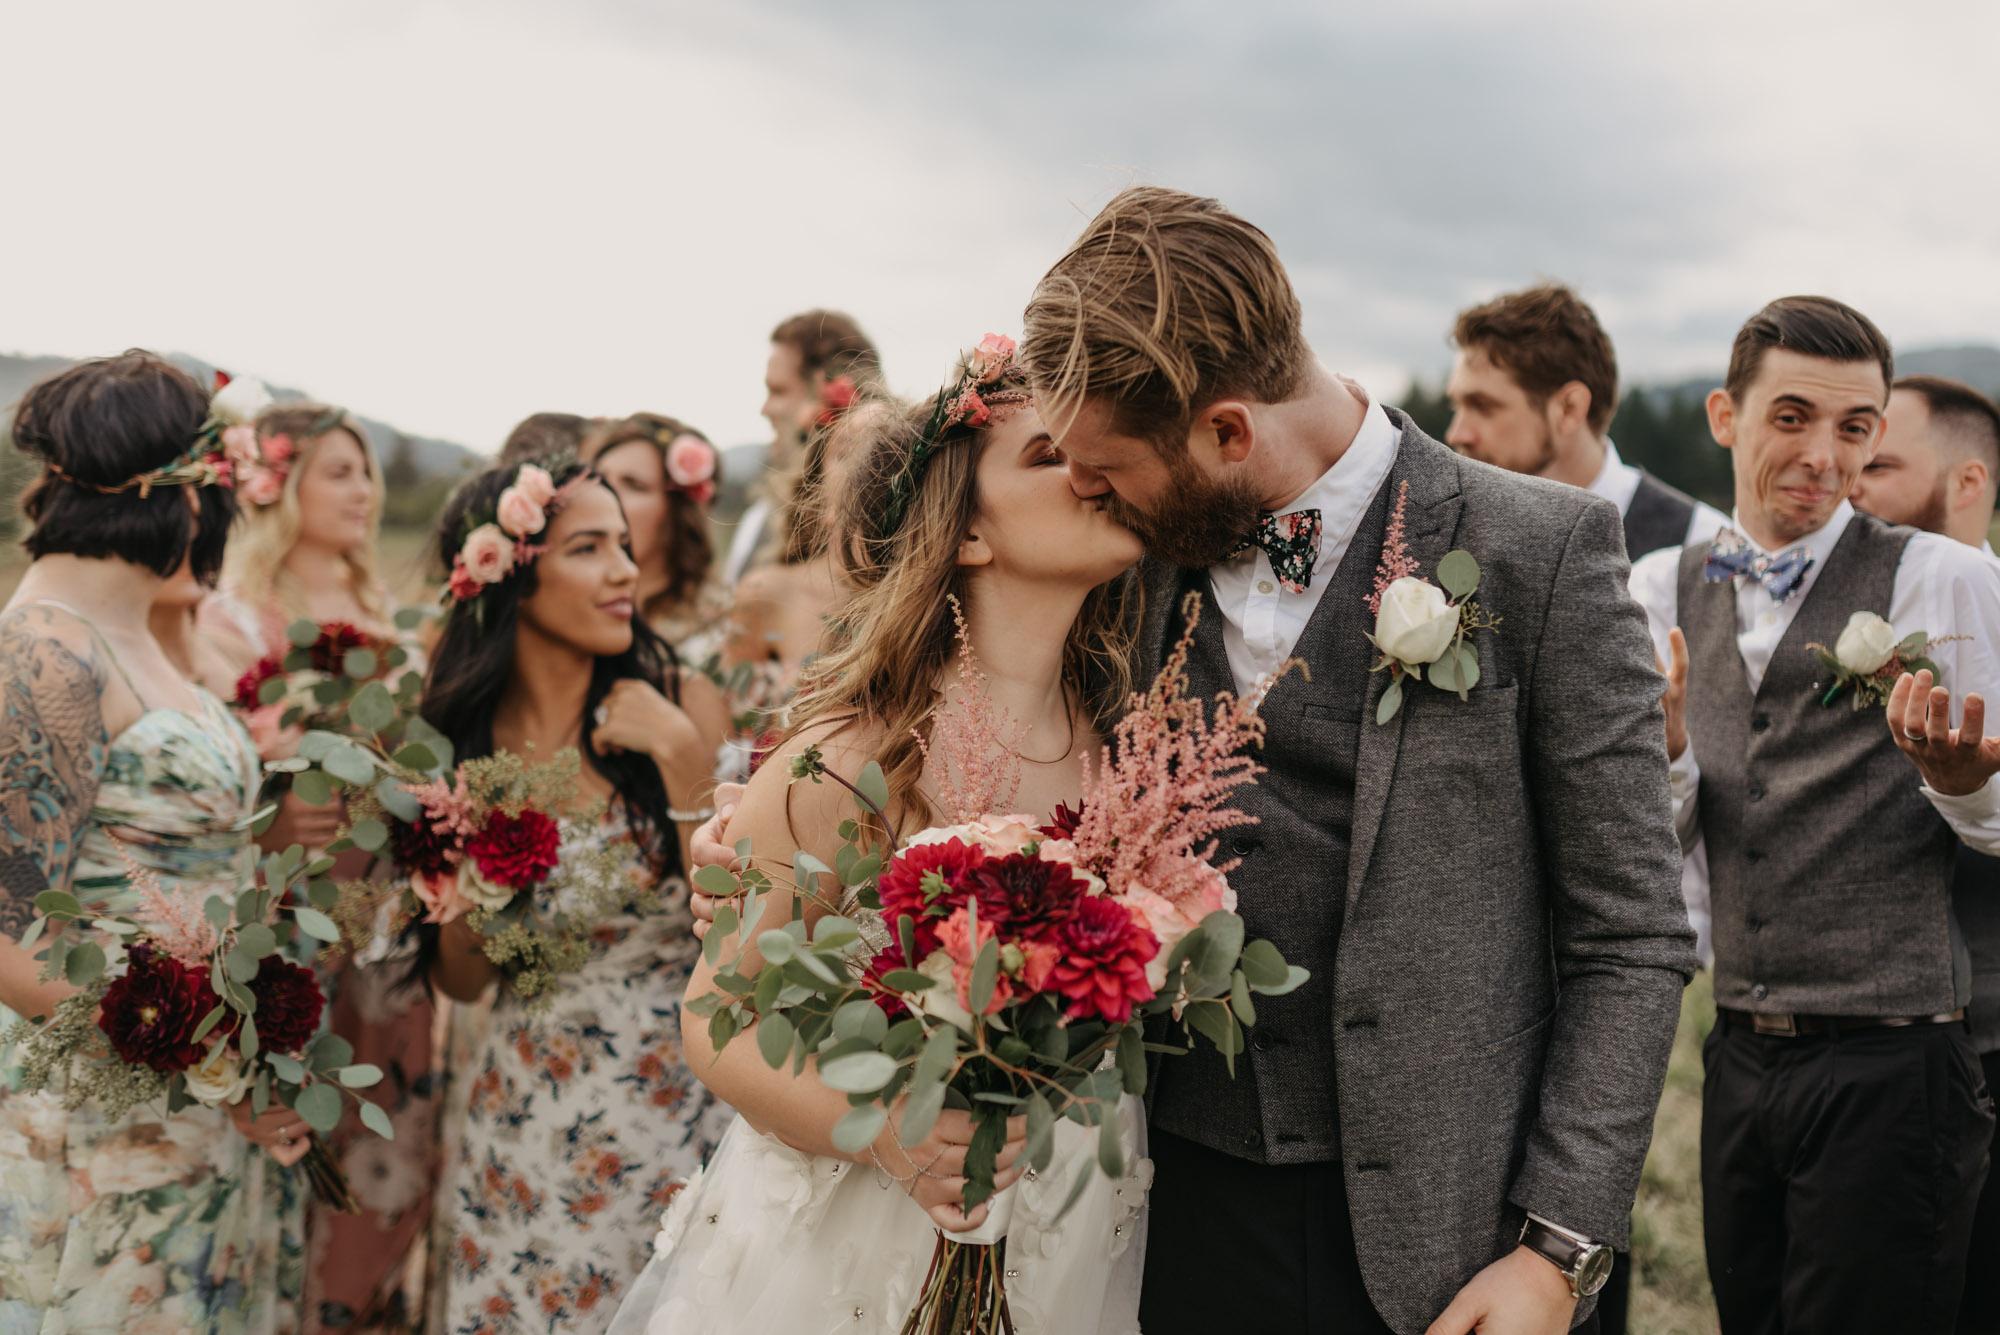 Bridal-Party-Free-People-Flower-Dresses-Washington-Wedding-8678.jpg